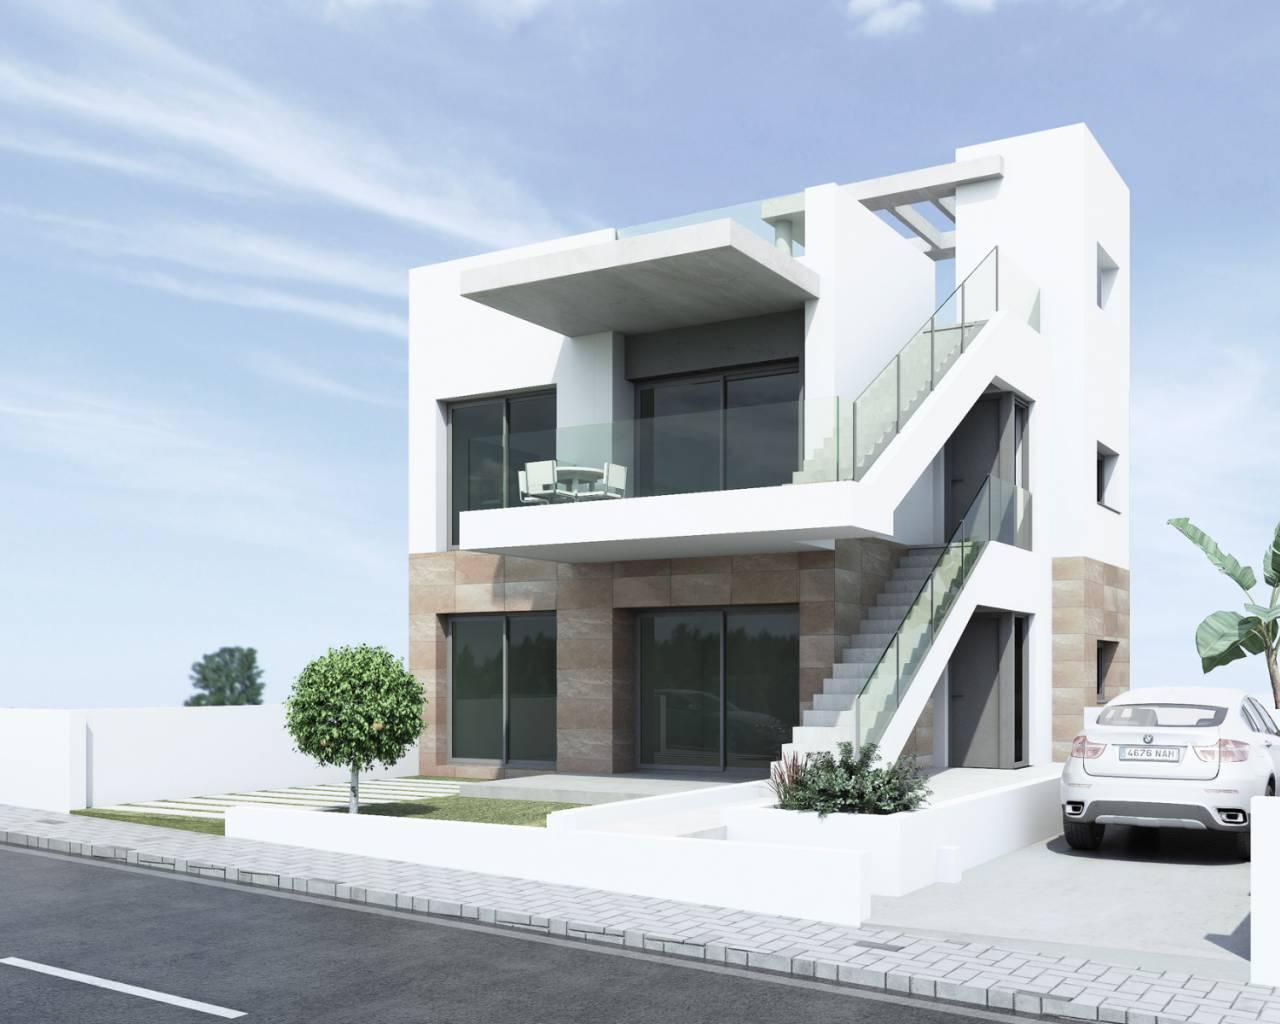 nieuwbouw-appartement-san-miguel-de-salinas_295_xl